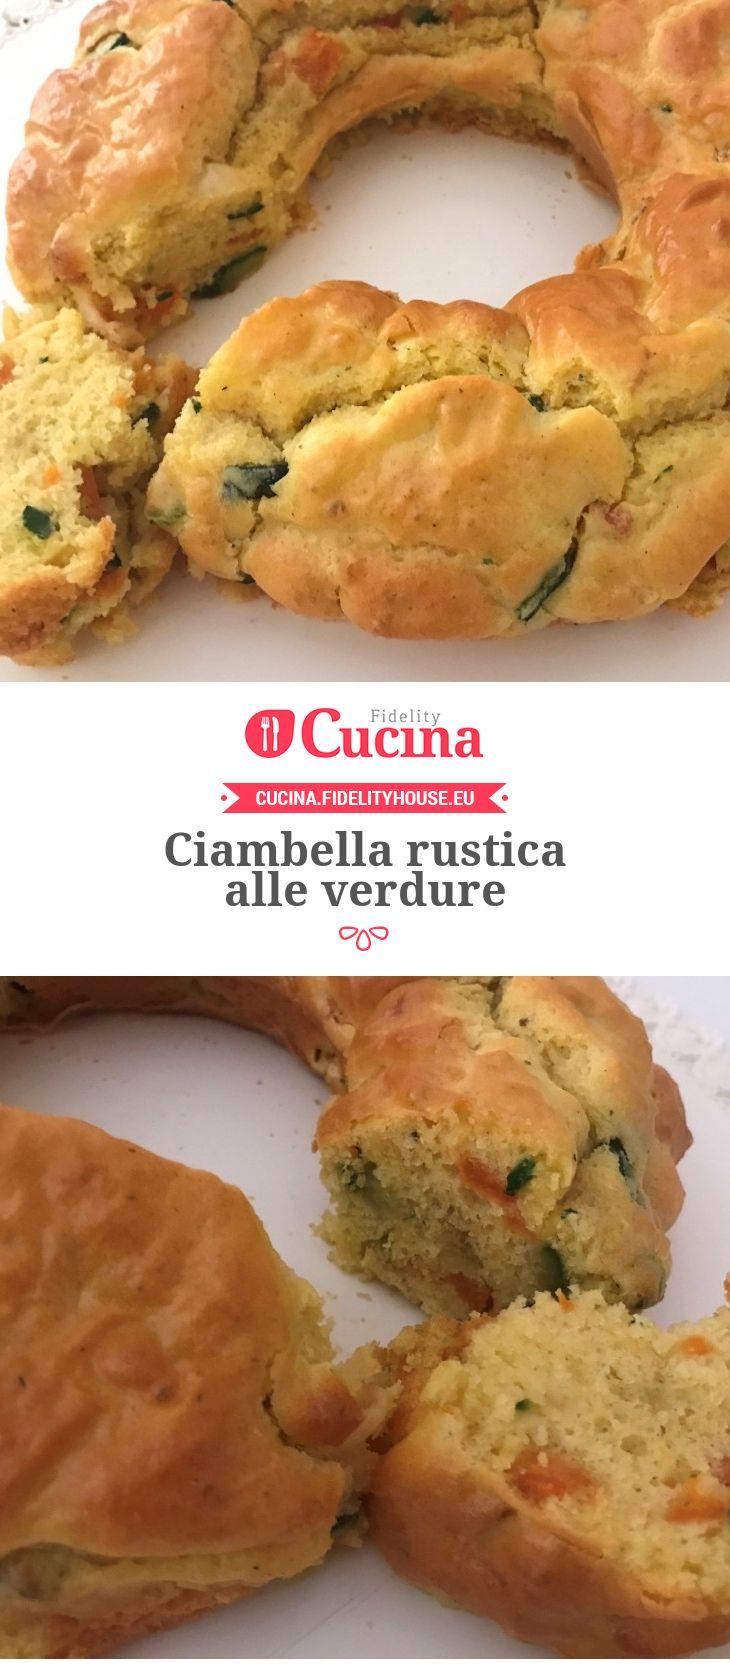 Ciambella rustica alle verdure